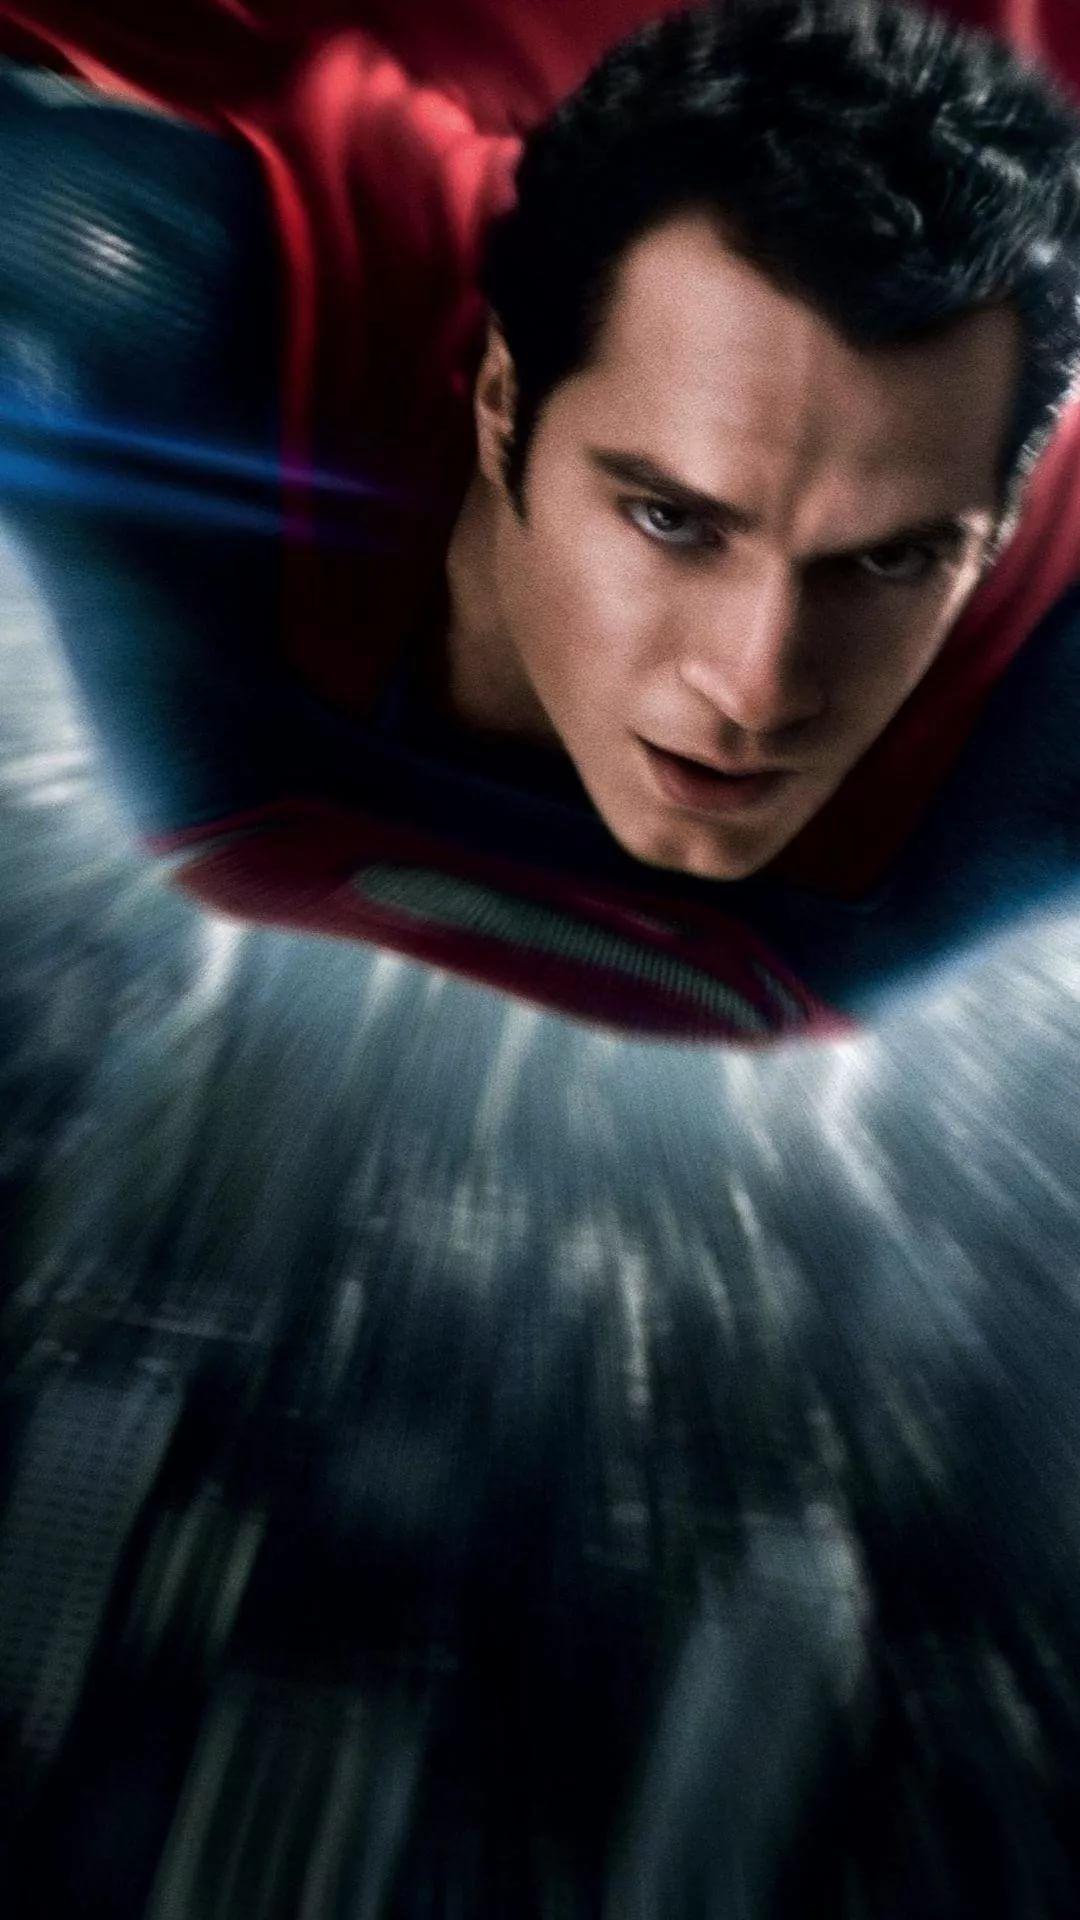 Superman iPhone xr wallpaper